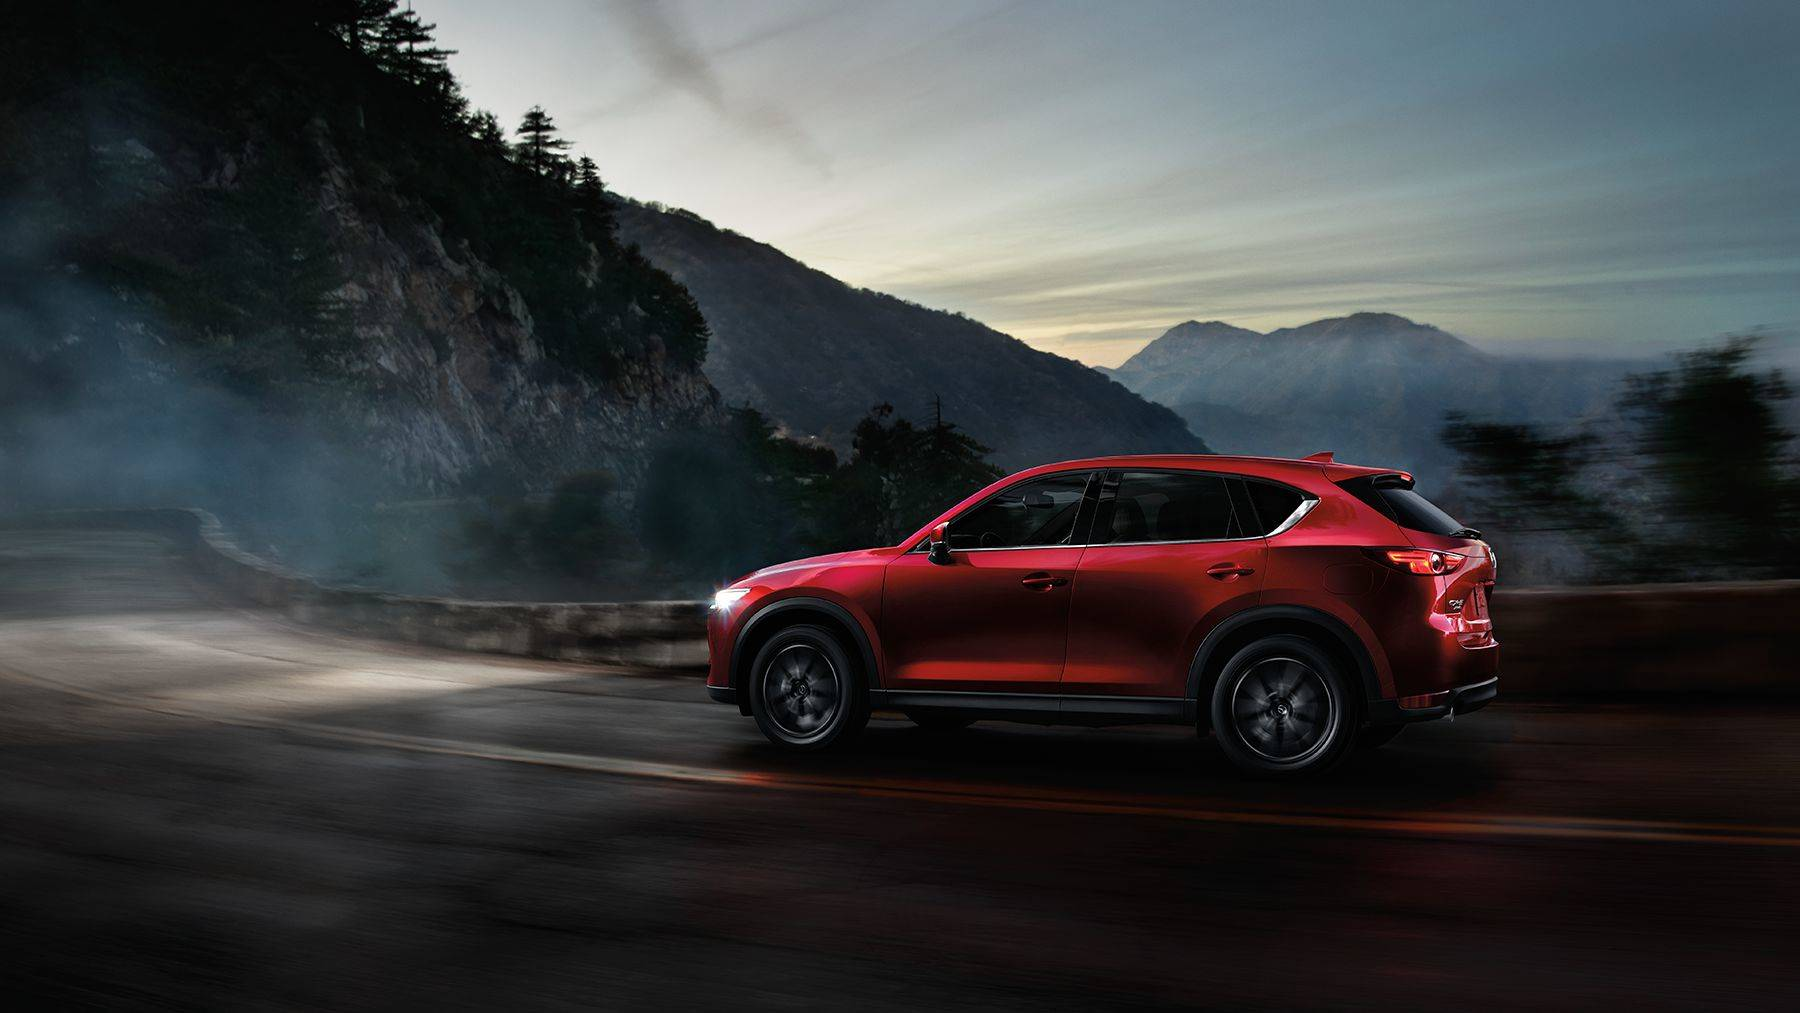 2019 Mazda CX-5 Financing near Pasadena, TX